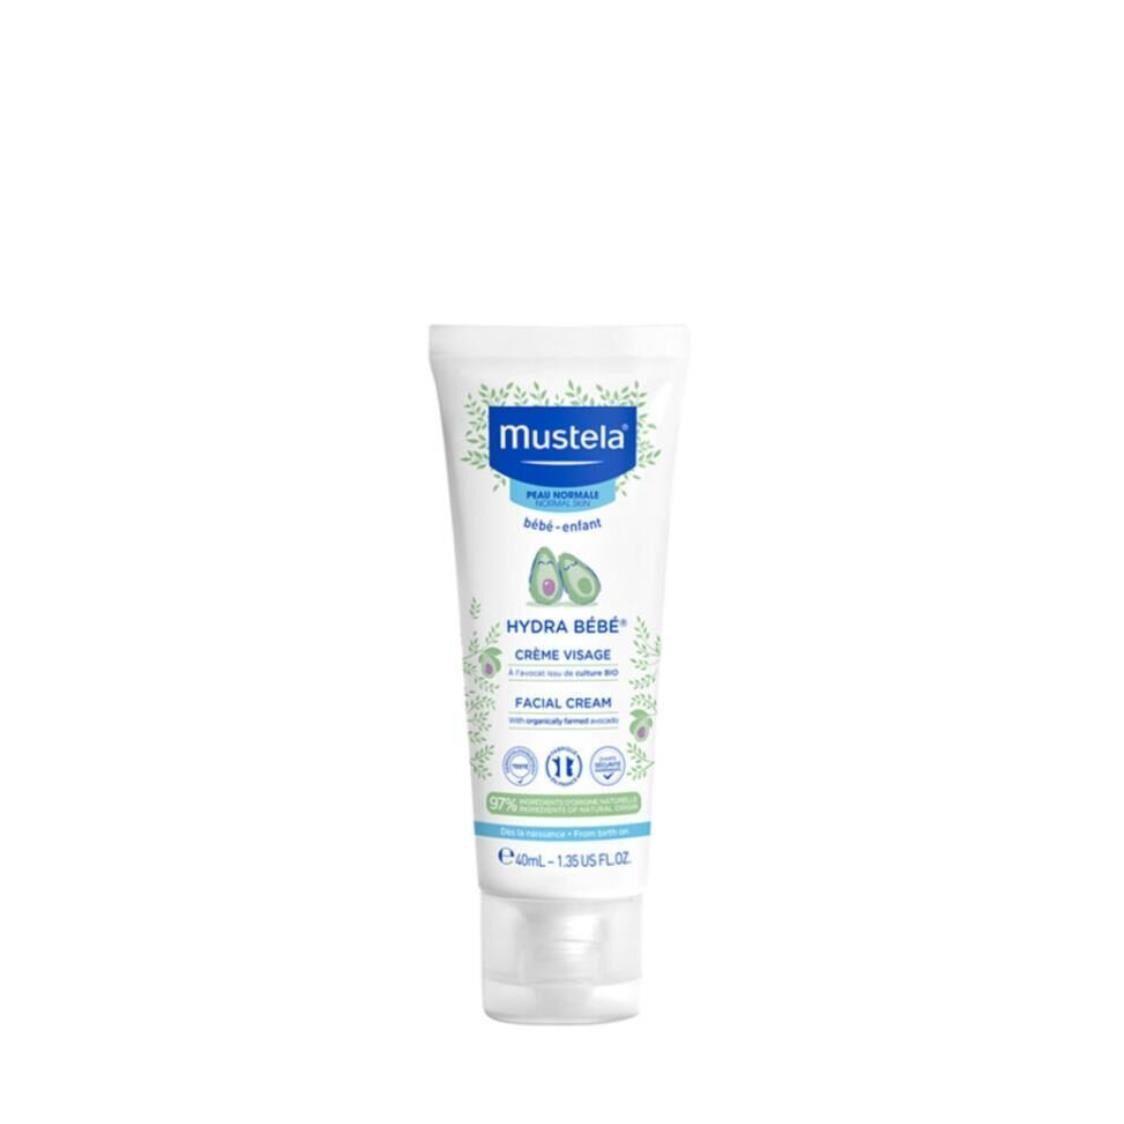 Mustela Cleansing Wipes 25pcs